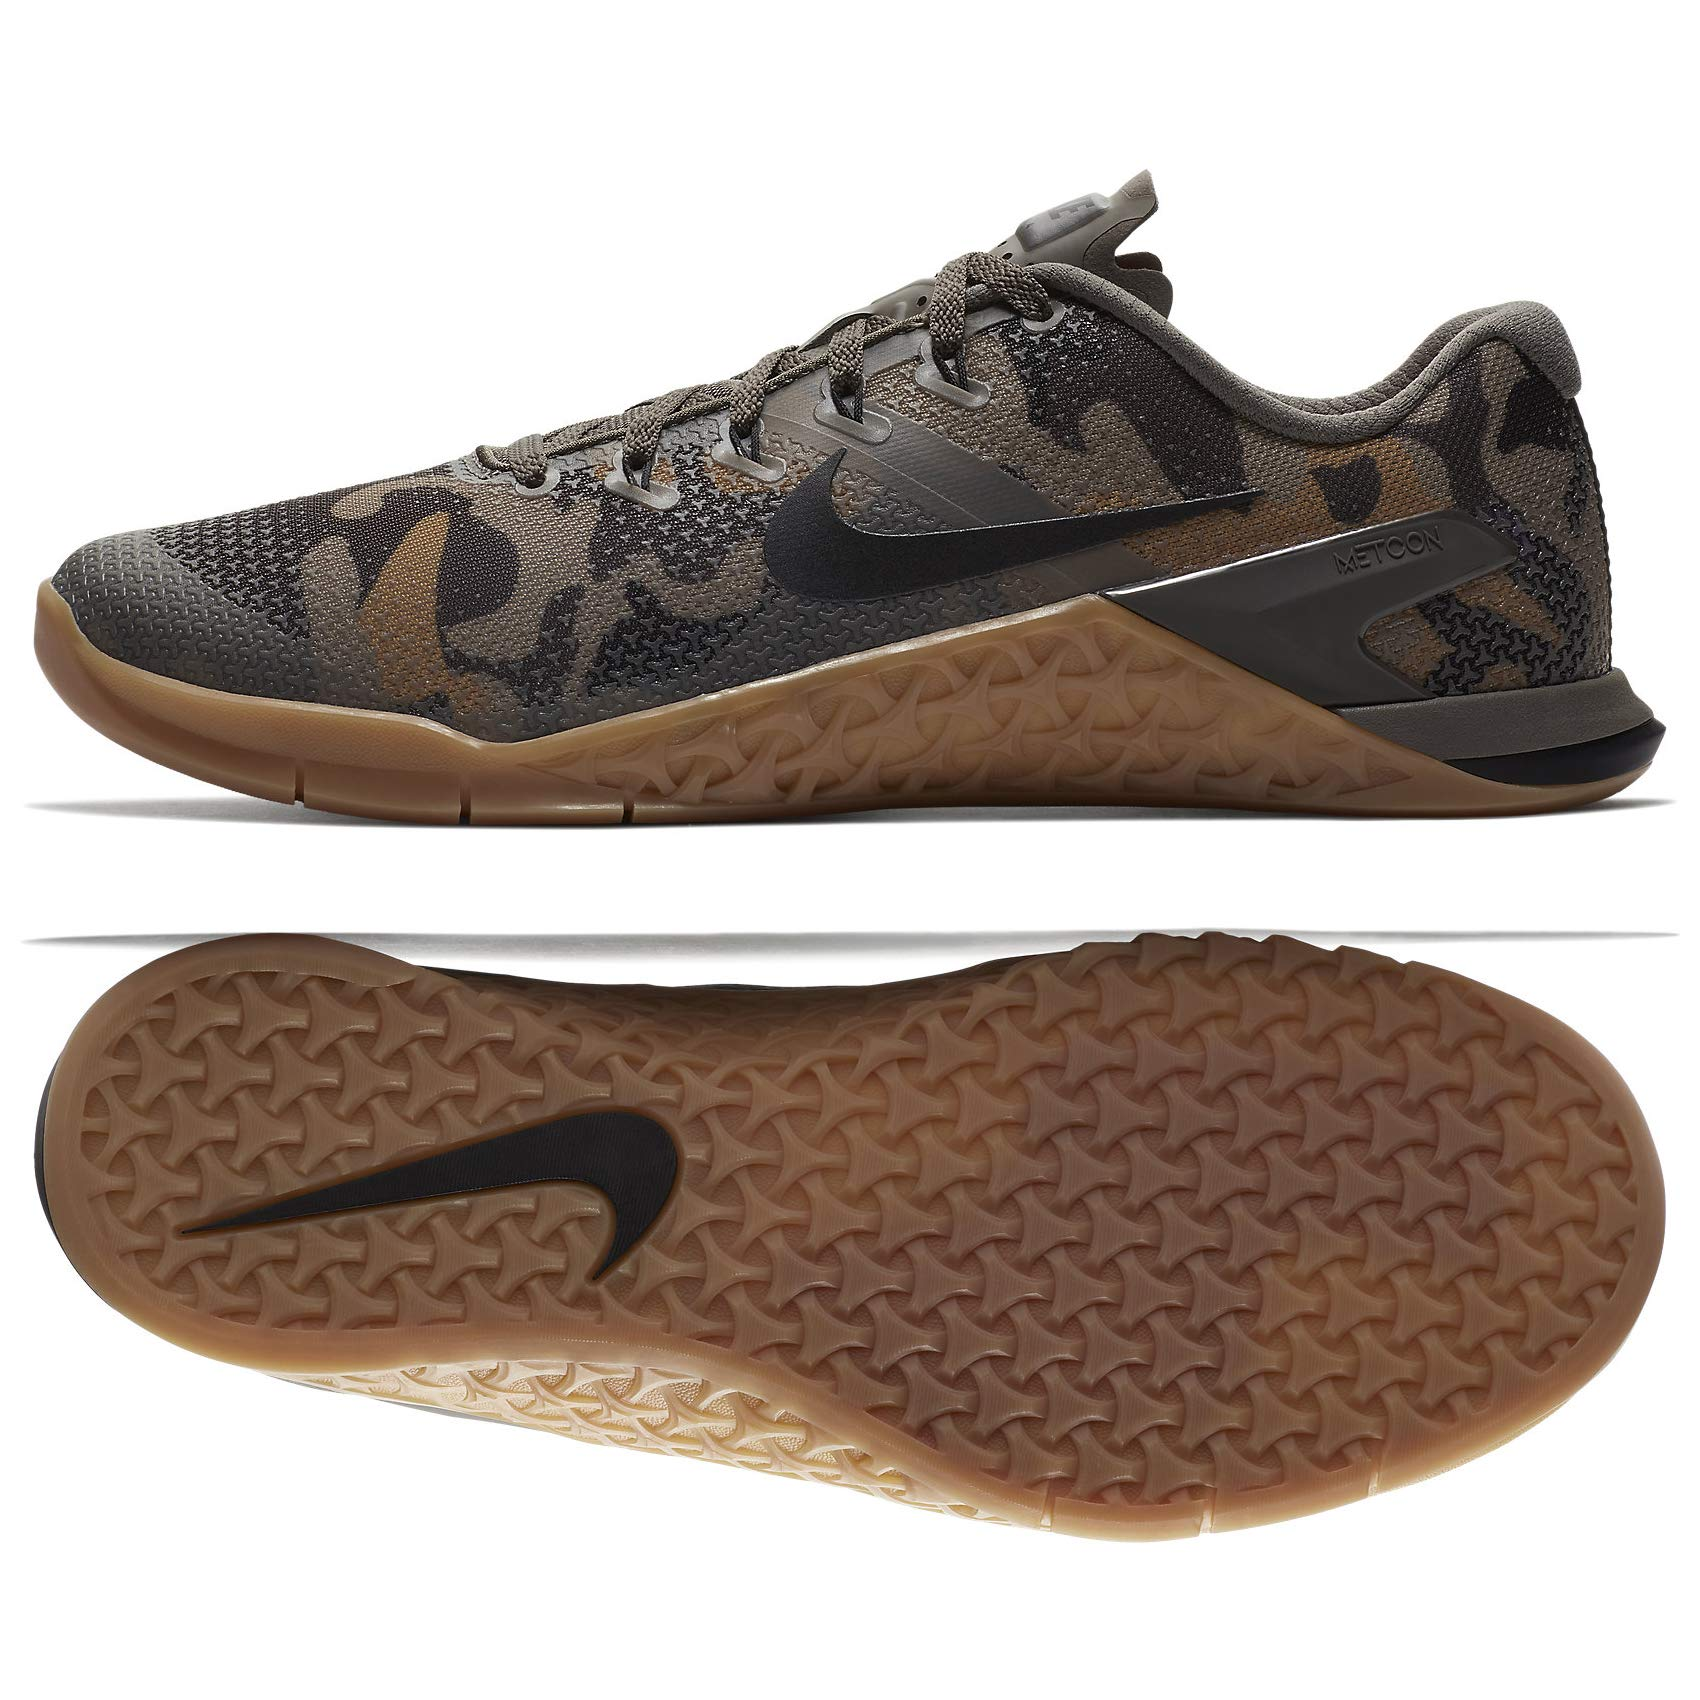 97a535dffd08 Galleon - Nike Metcon 4 AH7453 207 Ridgerock Black Gum Medium Brown Men s  Workout Shoes (9 D US)